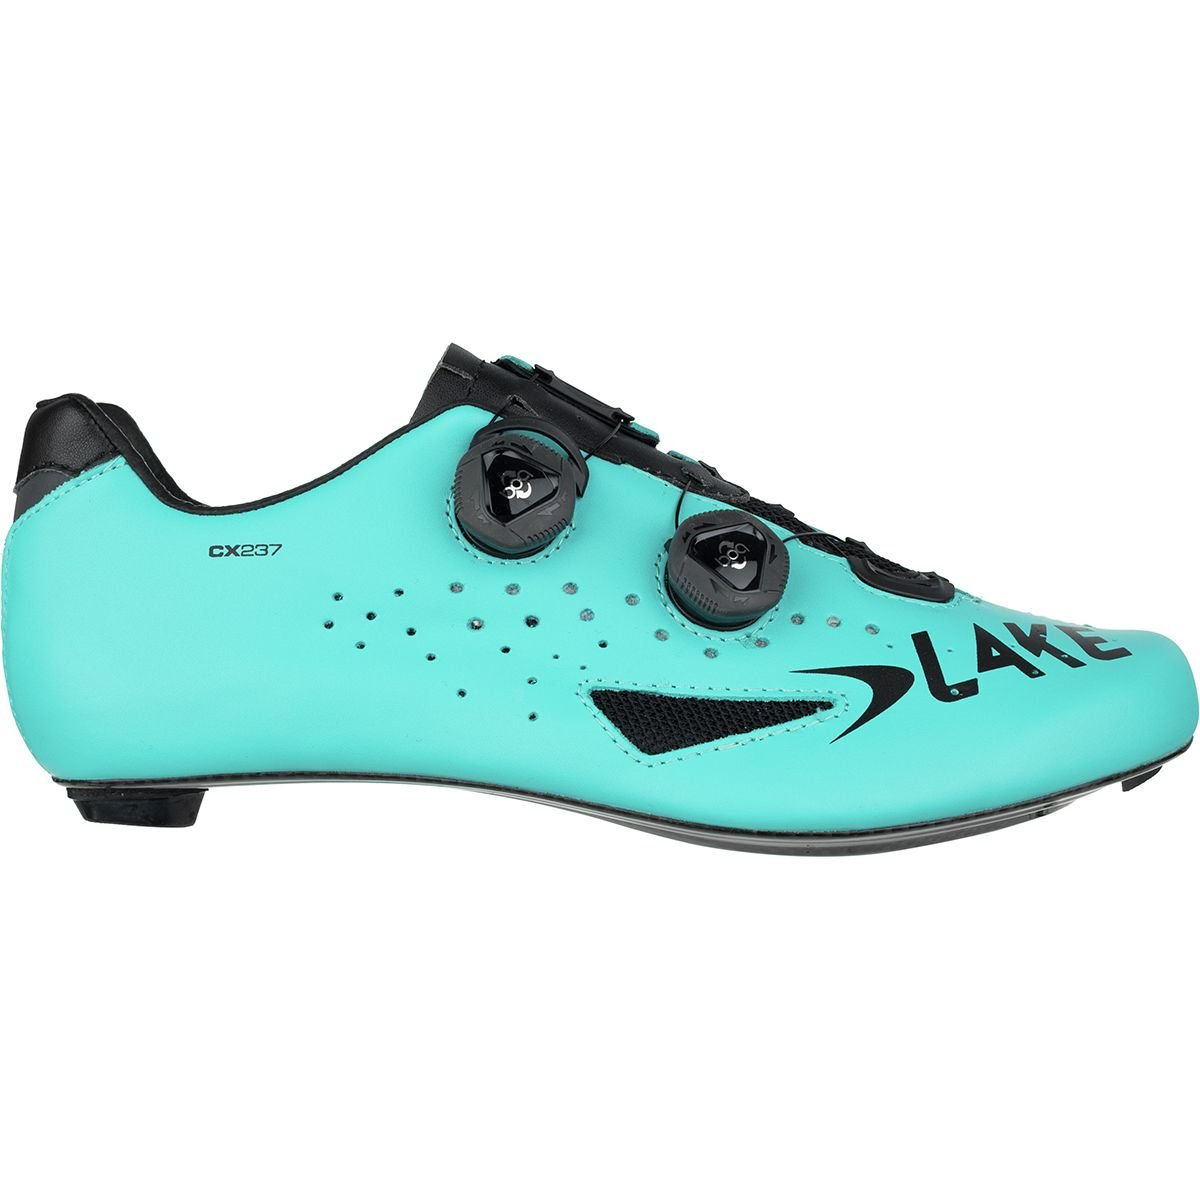 Lake CX237 Road Shoes - Men's Blue/Black, 43.0